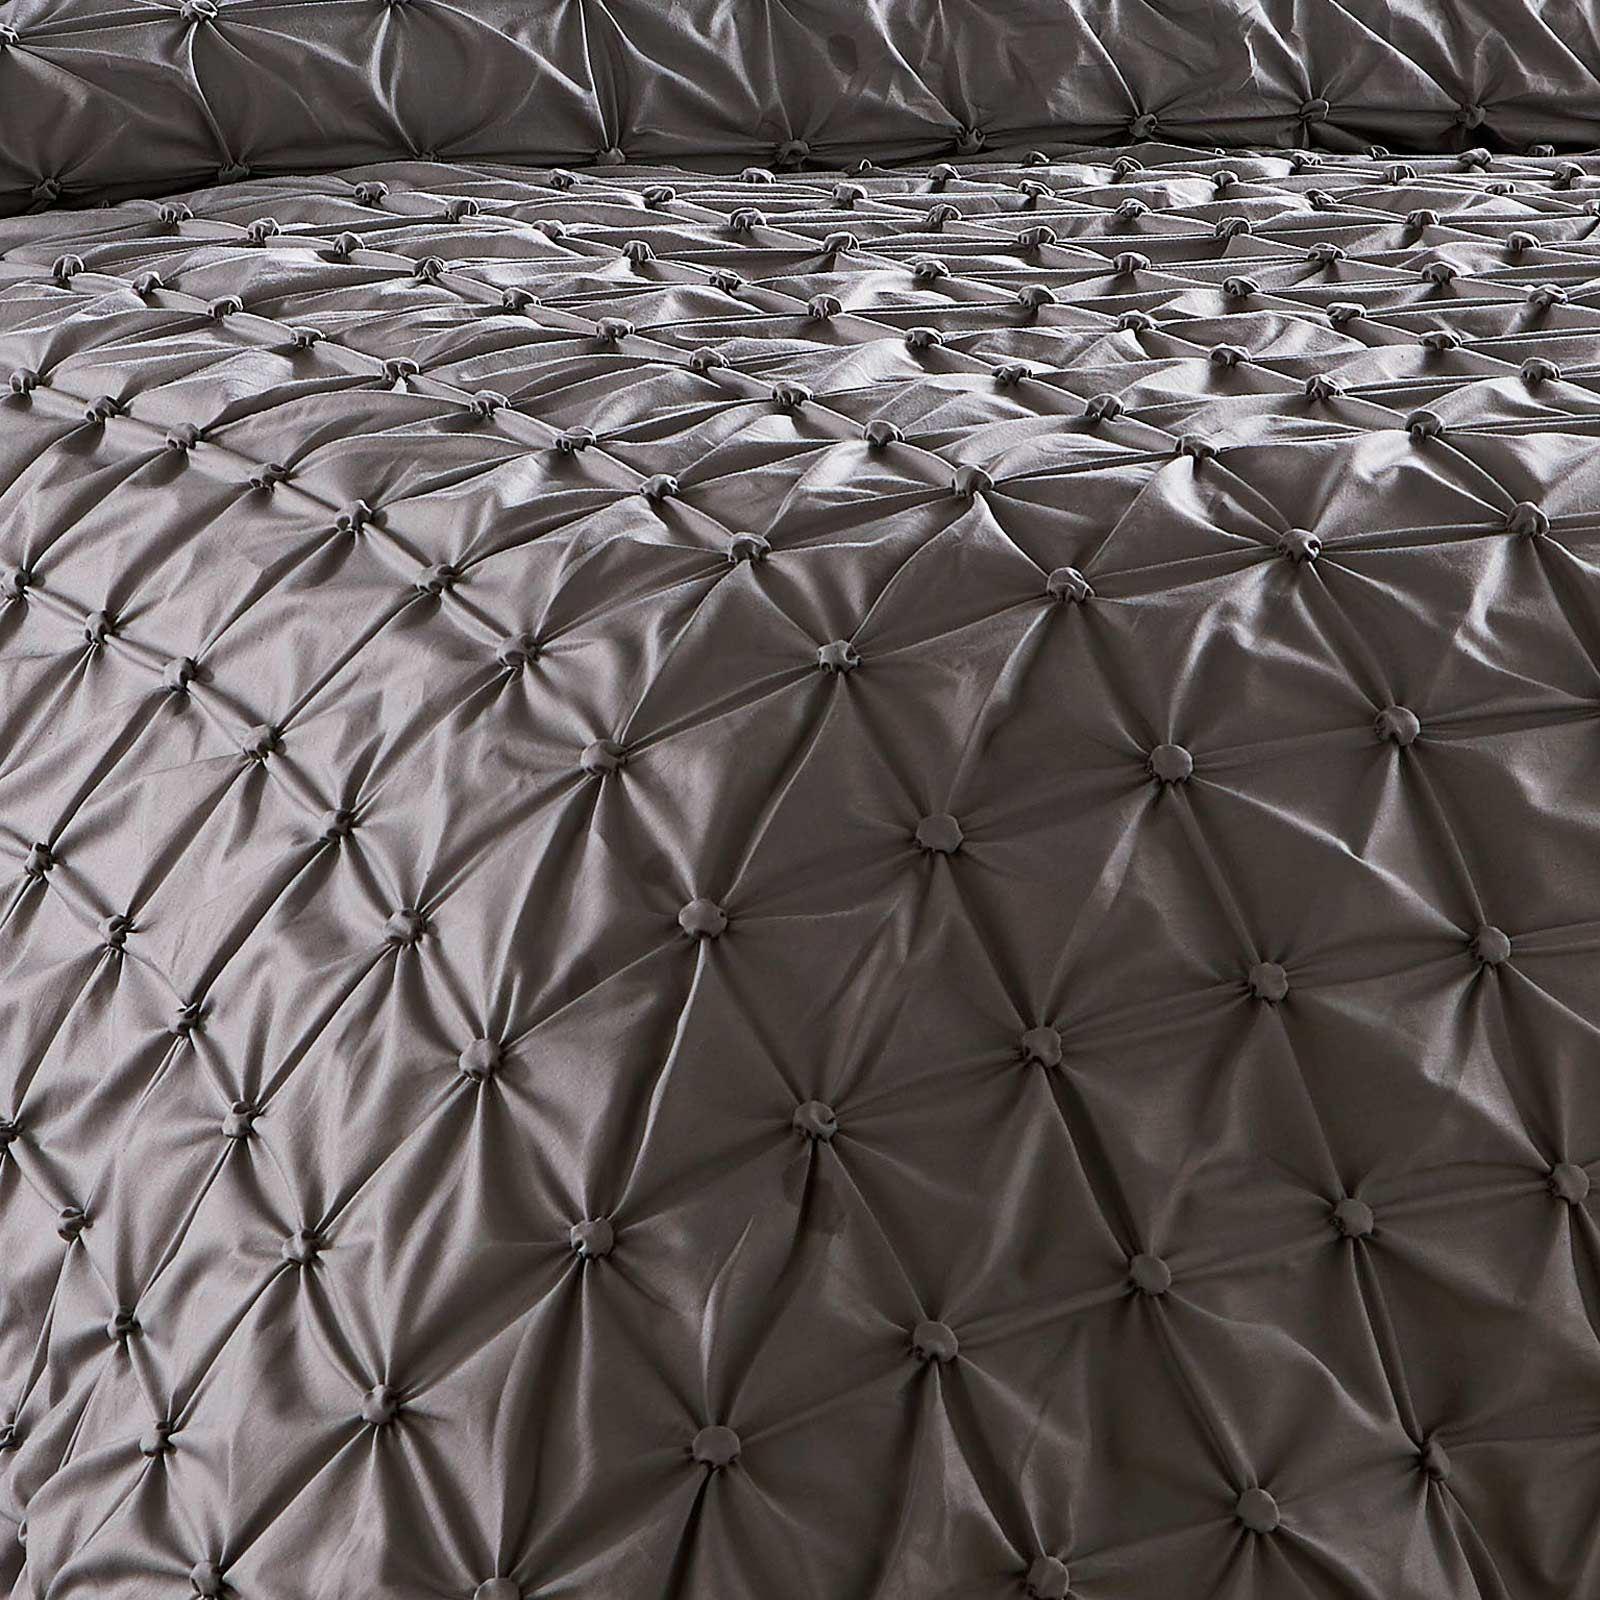 Pleated-Duvet-Covers-Seville-Pintuck-Luxury-Cotton-Rich-Quilt-Bedding-Sets thumbnail 3